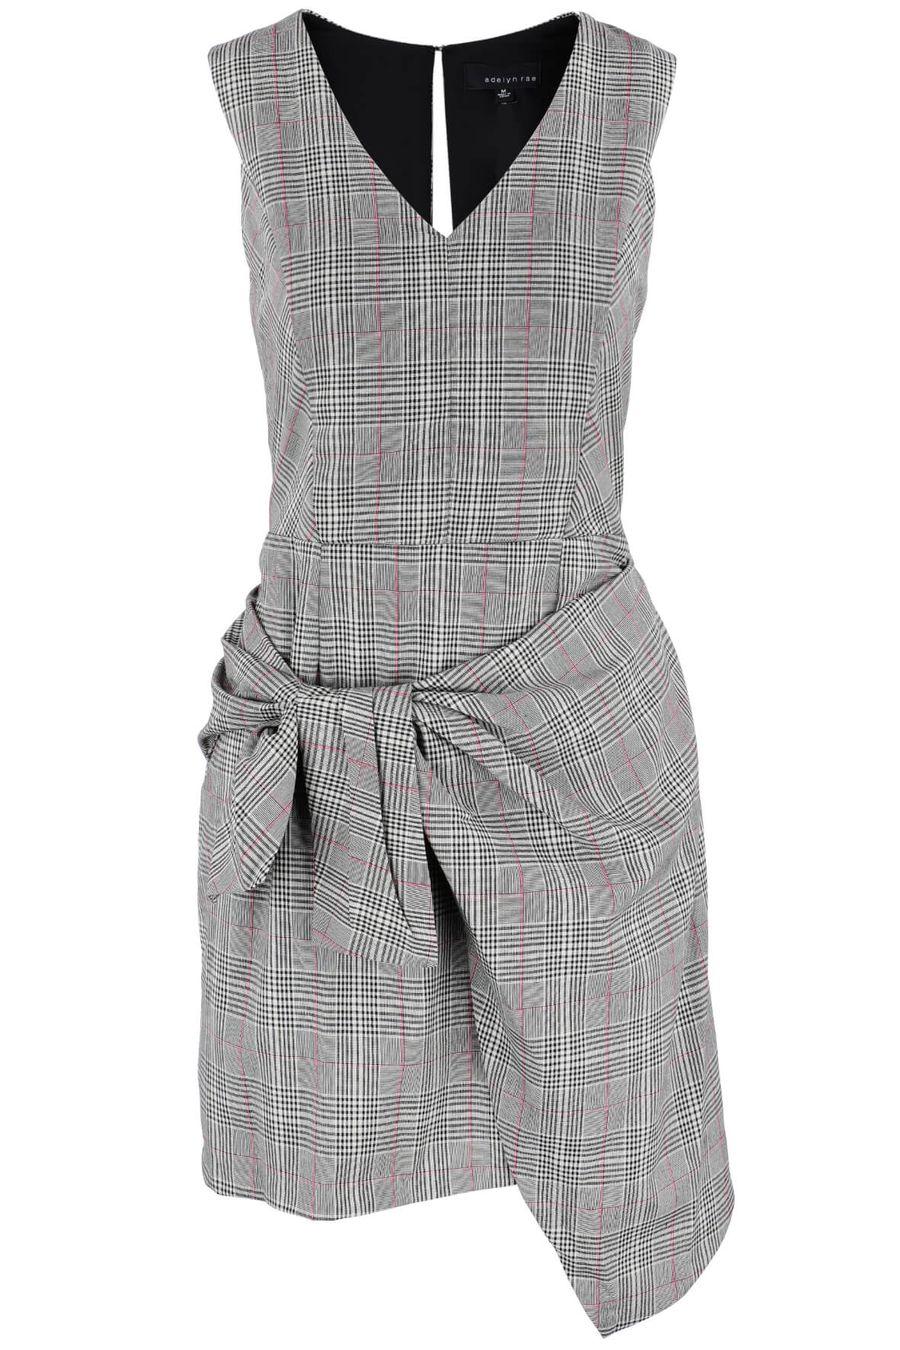 adelyn-rae-aurora-woven-plaid-tie-sheath-dress-1